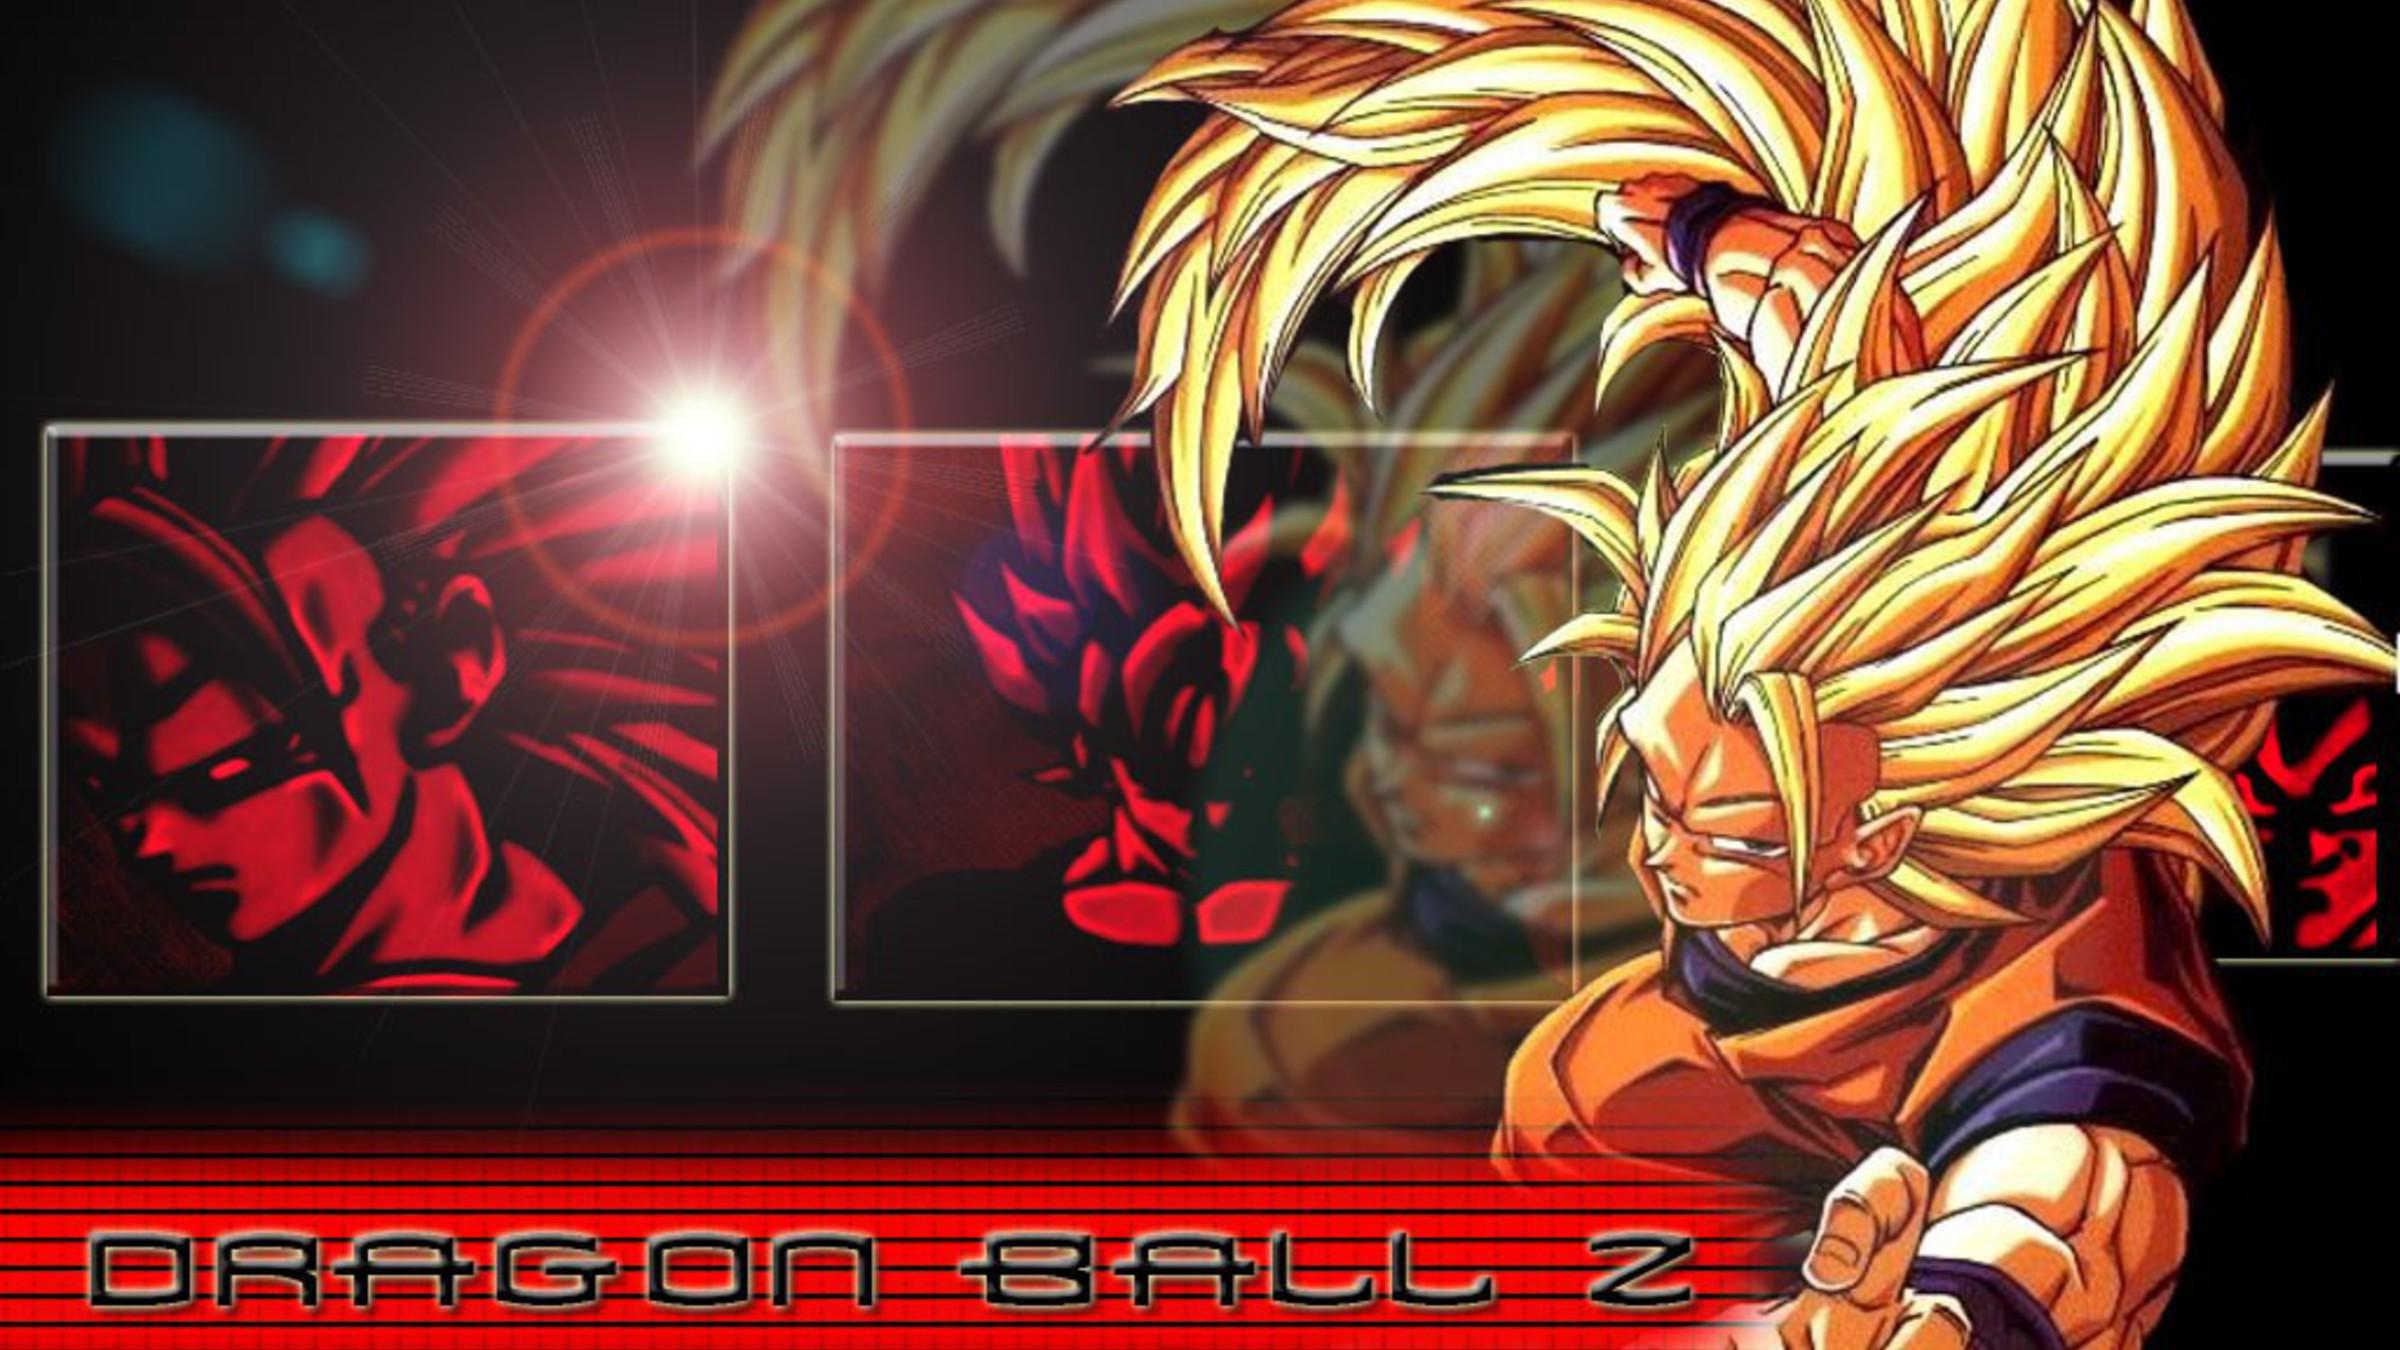 Son Goku Dragon Ball Z Ssj Wallpaper Super Saiyan 3 Goku